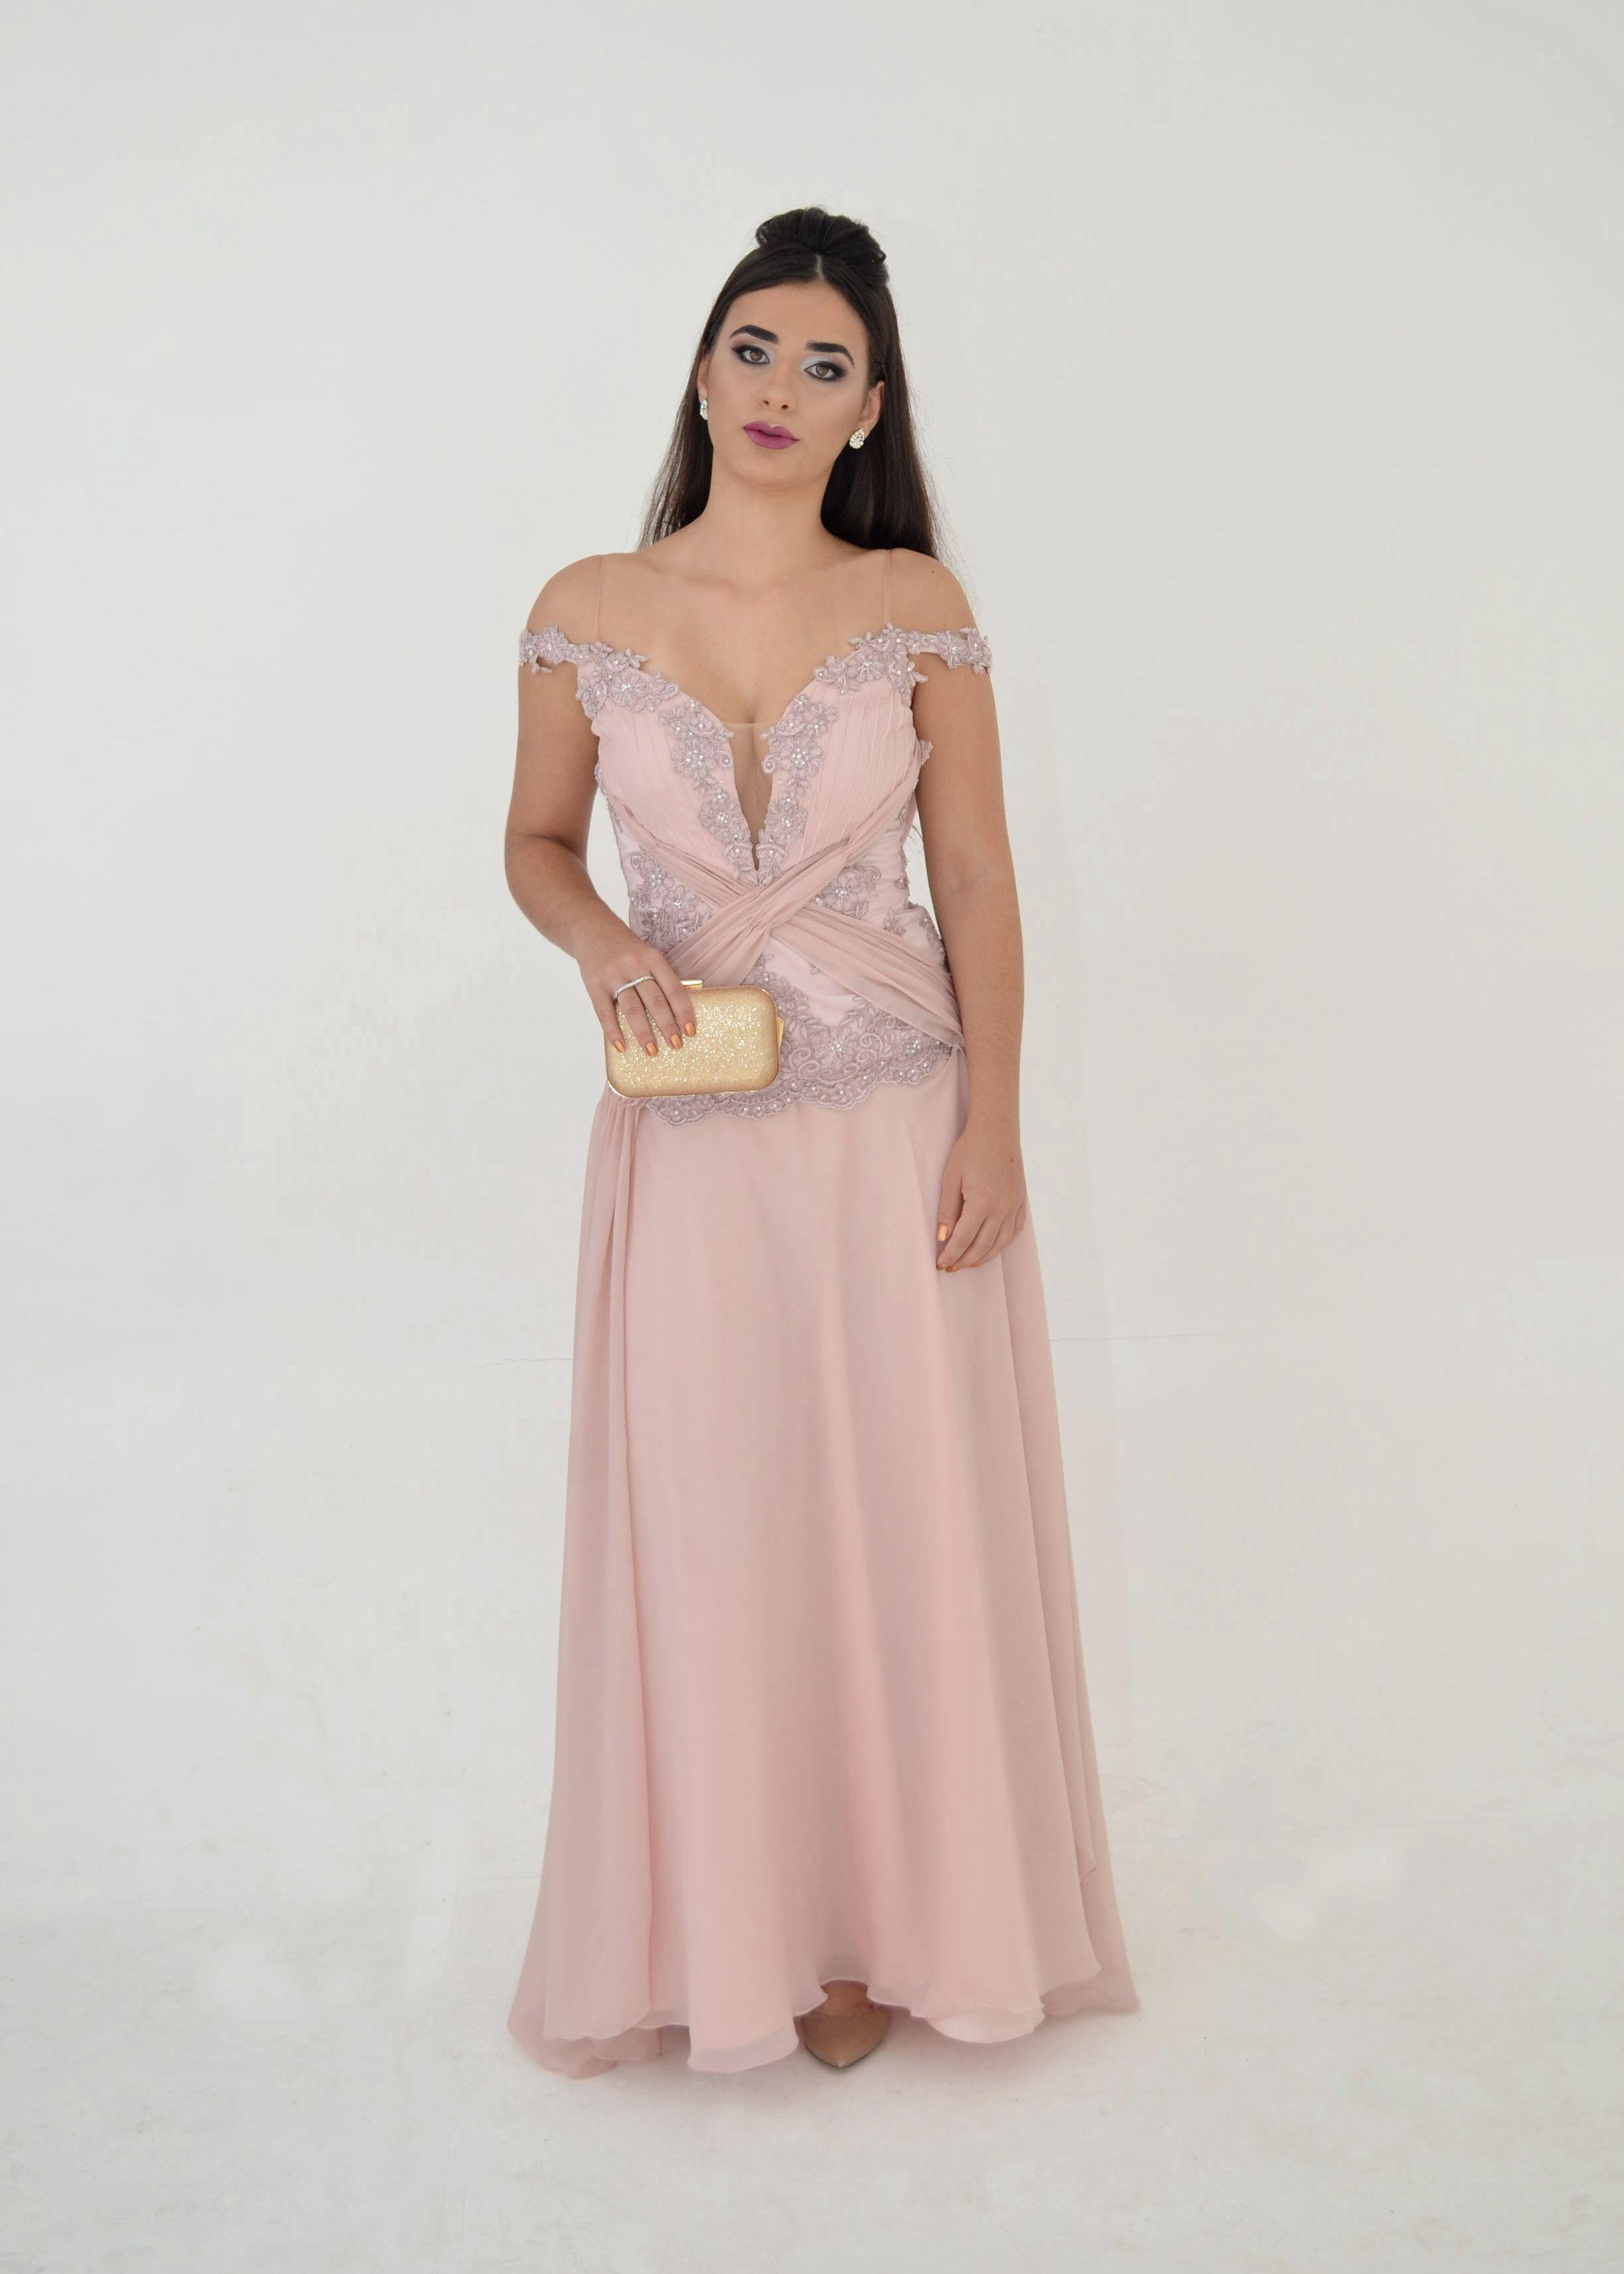 Vestido Rosa Quartz longo com renda, ombro a ombro, Drapeado ...